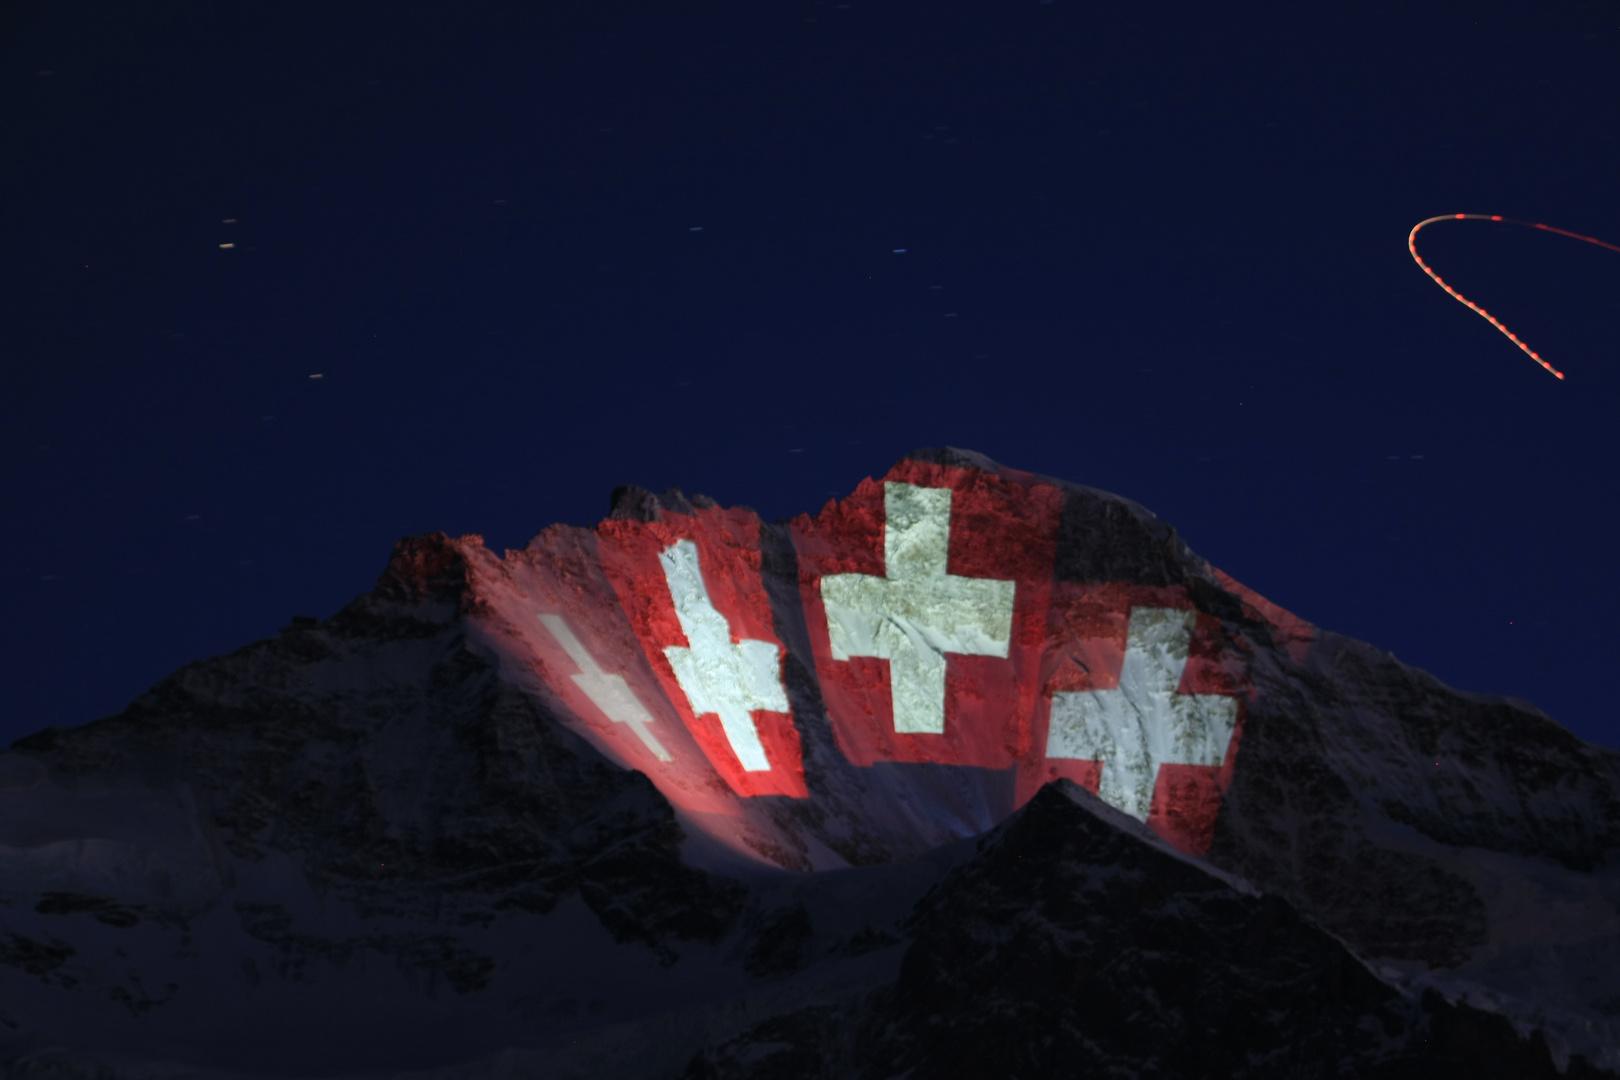 Jungfraujoch Beleuchtung (100 Jahr Jubiläum der Jungfraubahn)